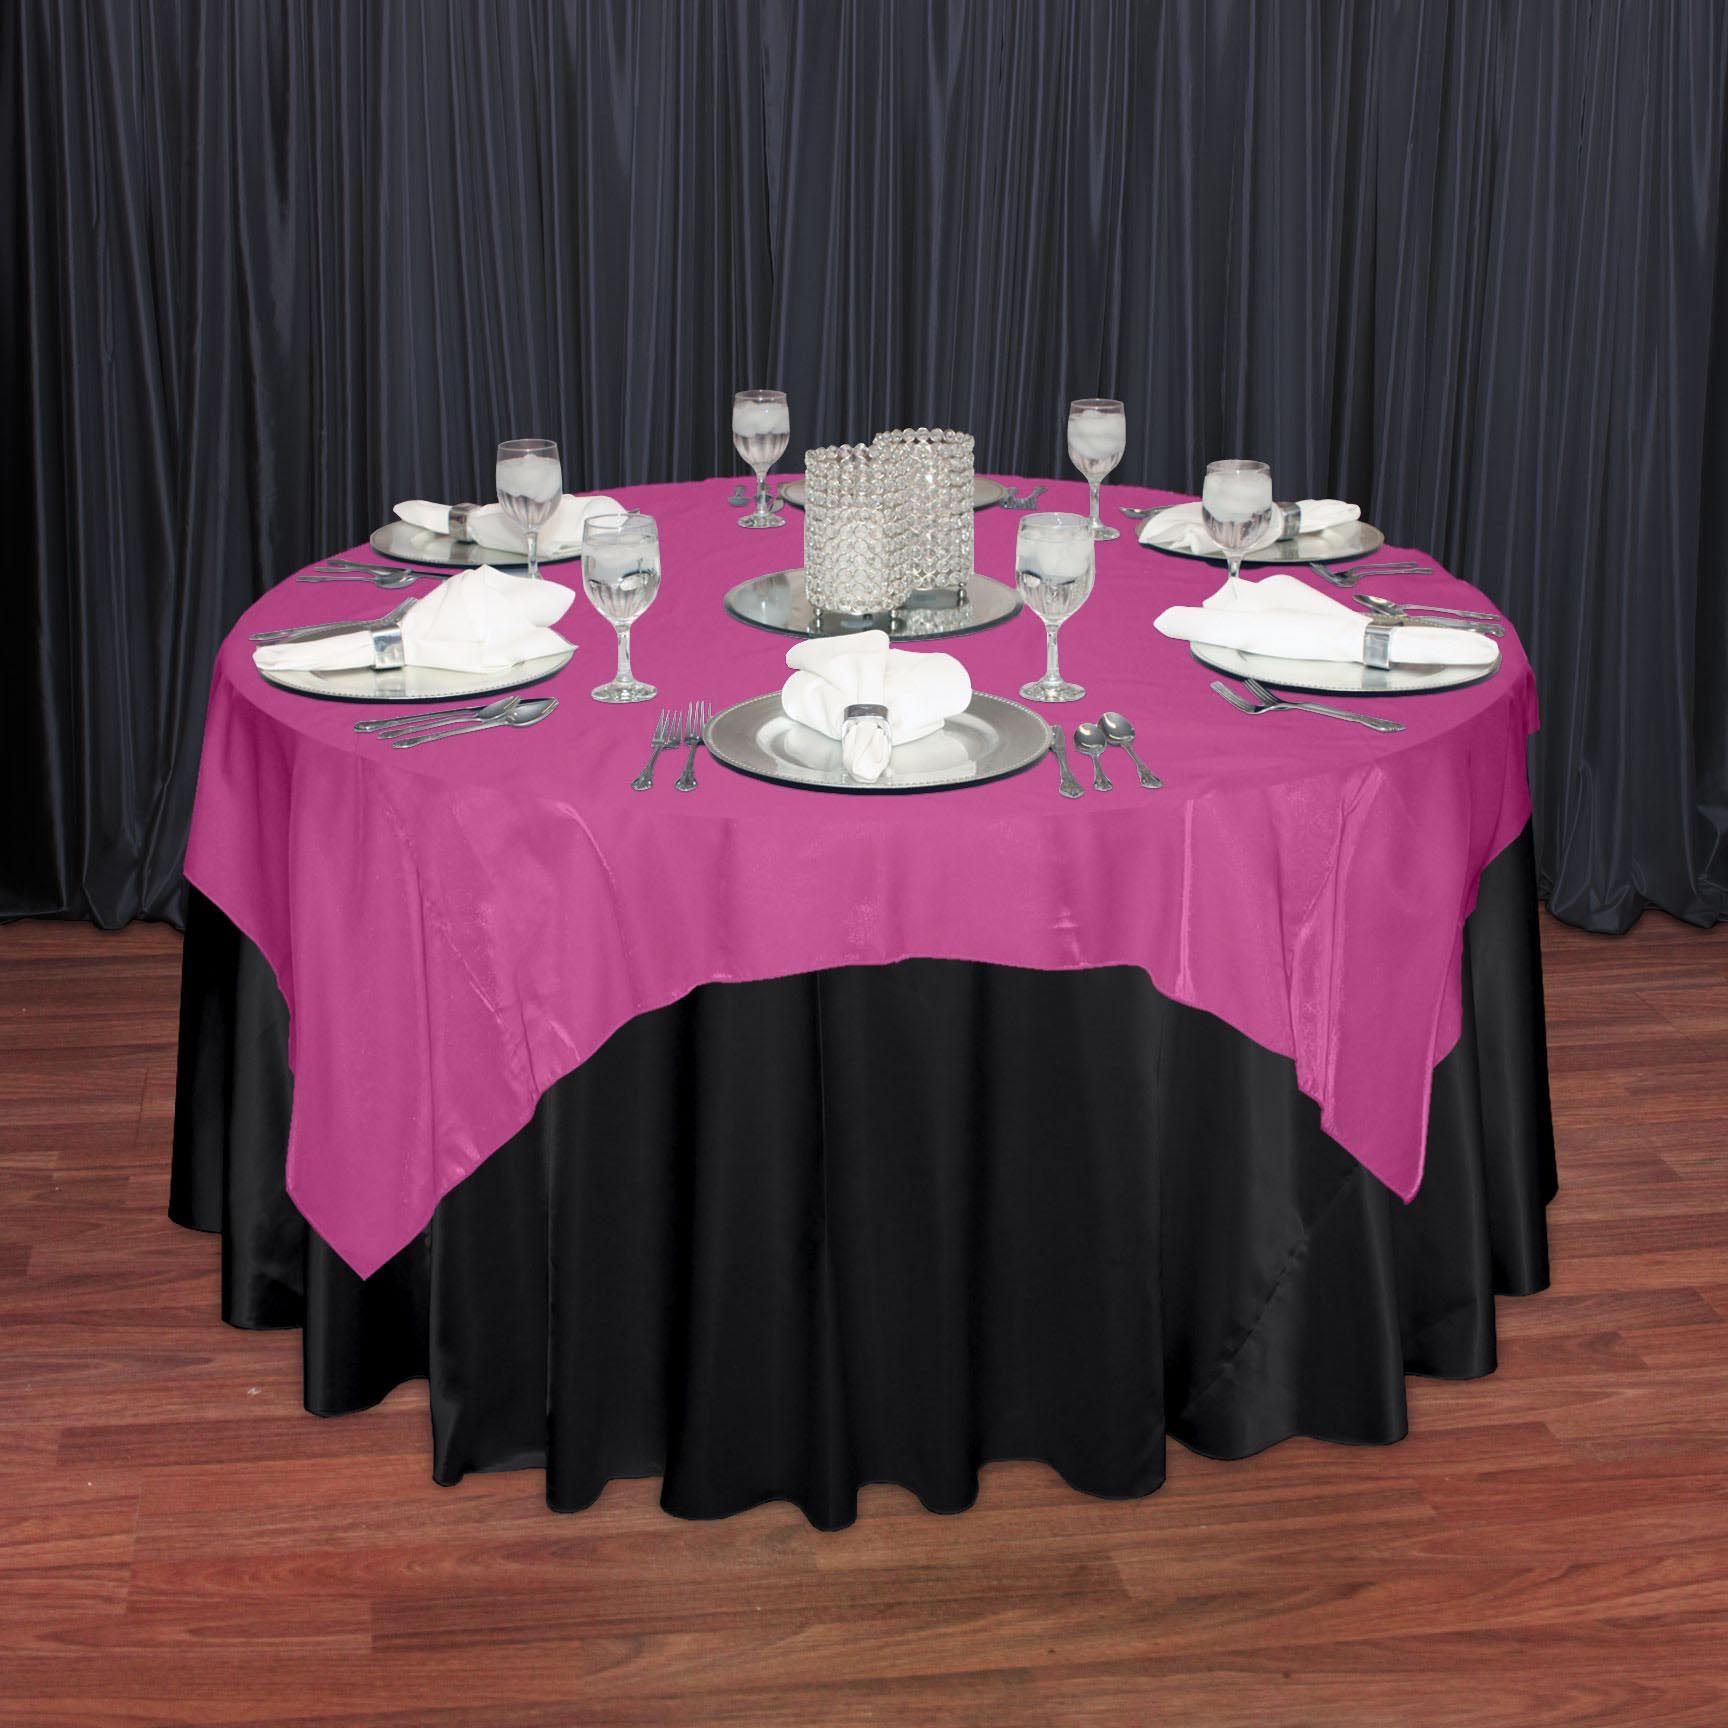 Beyond Elegance: Fuchsia Organza Satin Overlay Over A Black Satin Polyester  Tablecloth